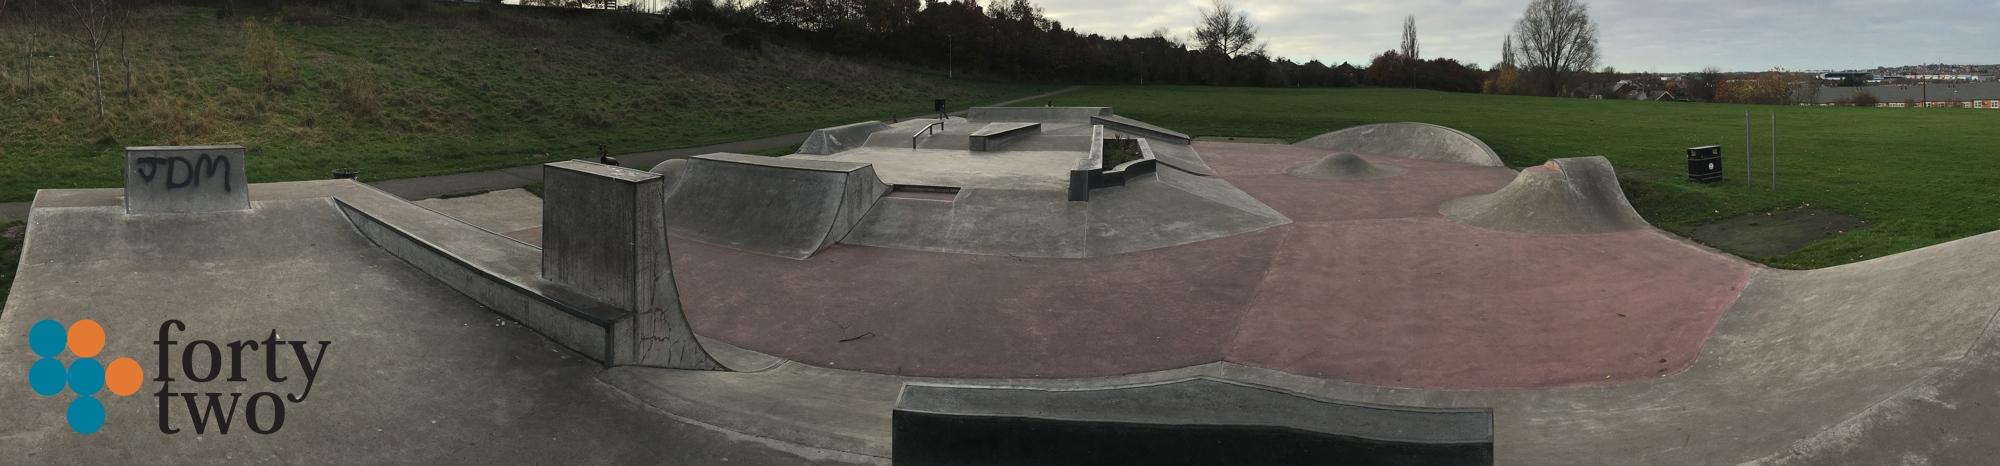 Mansfield Plaza Skateboard Park Image Two